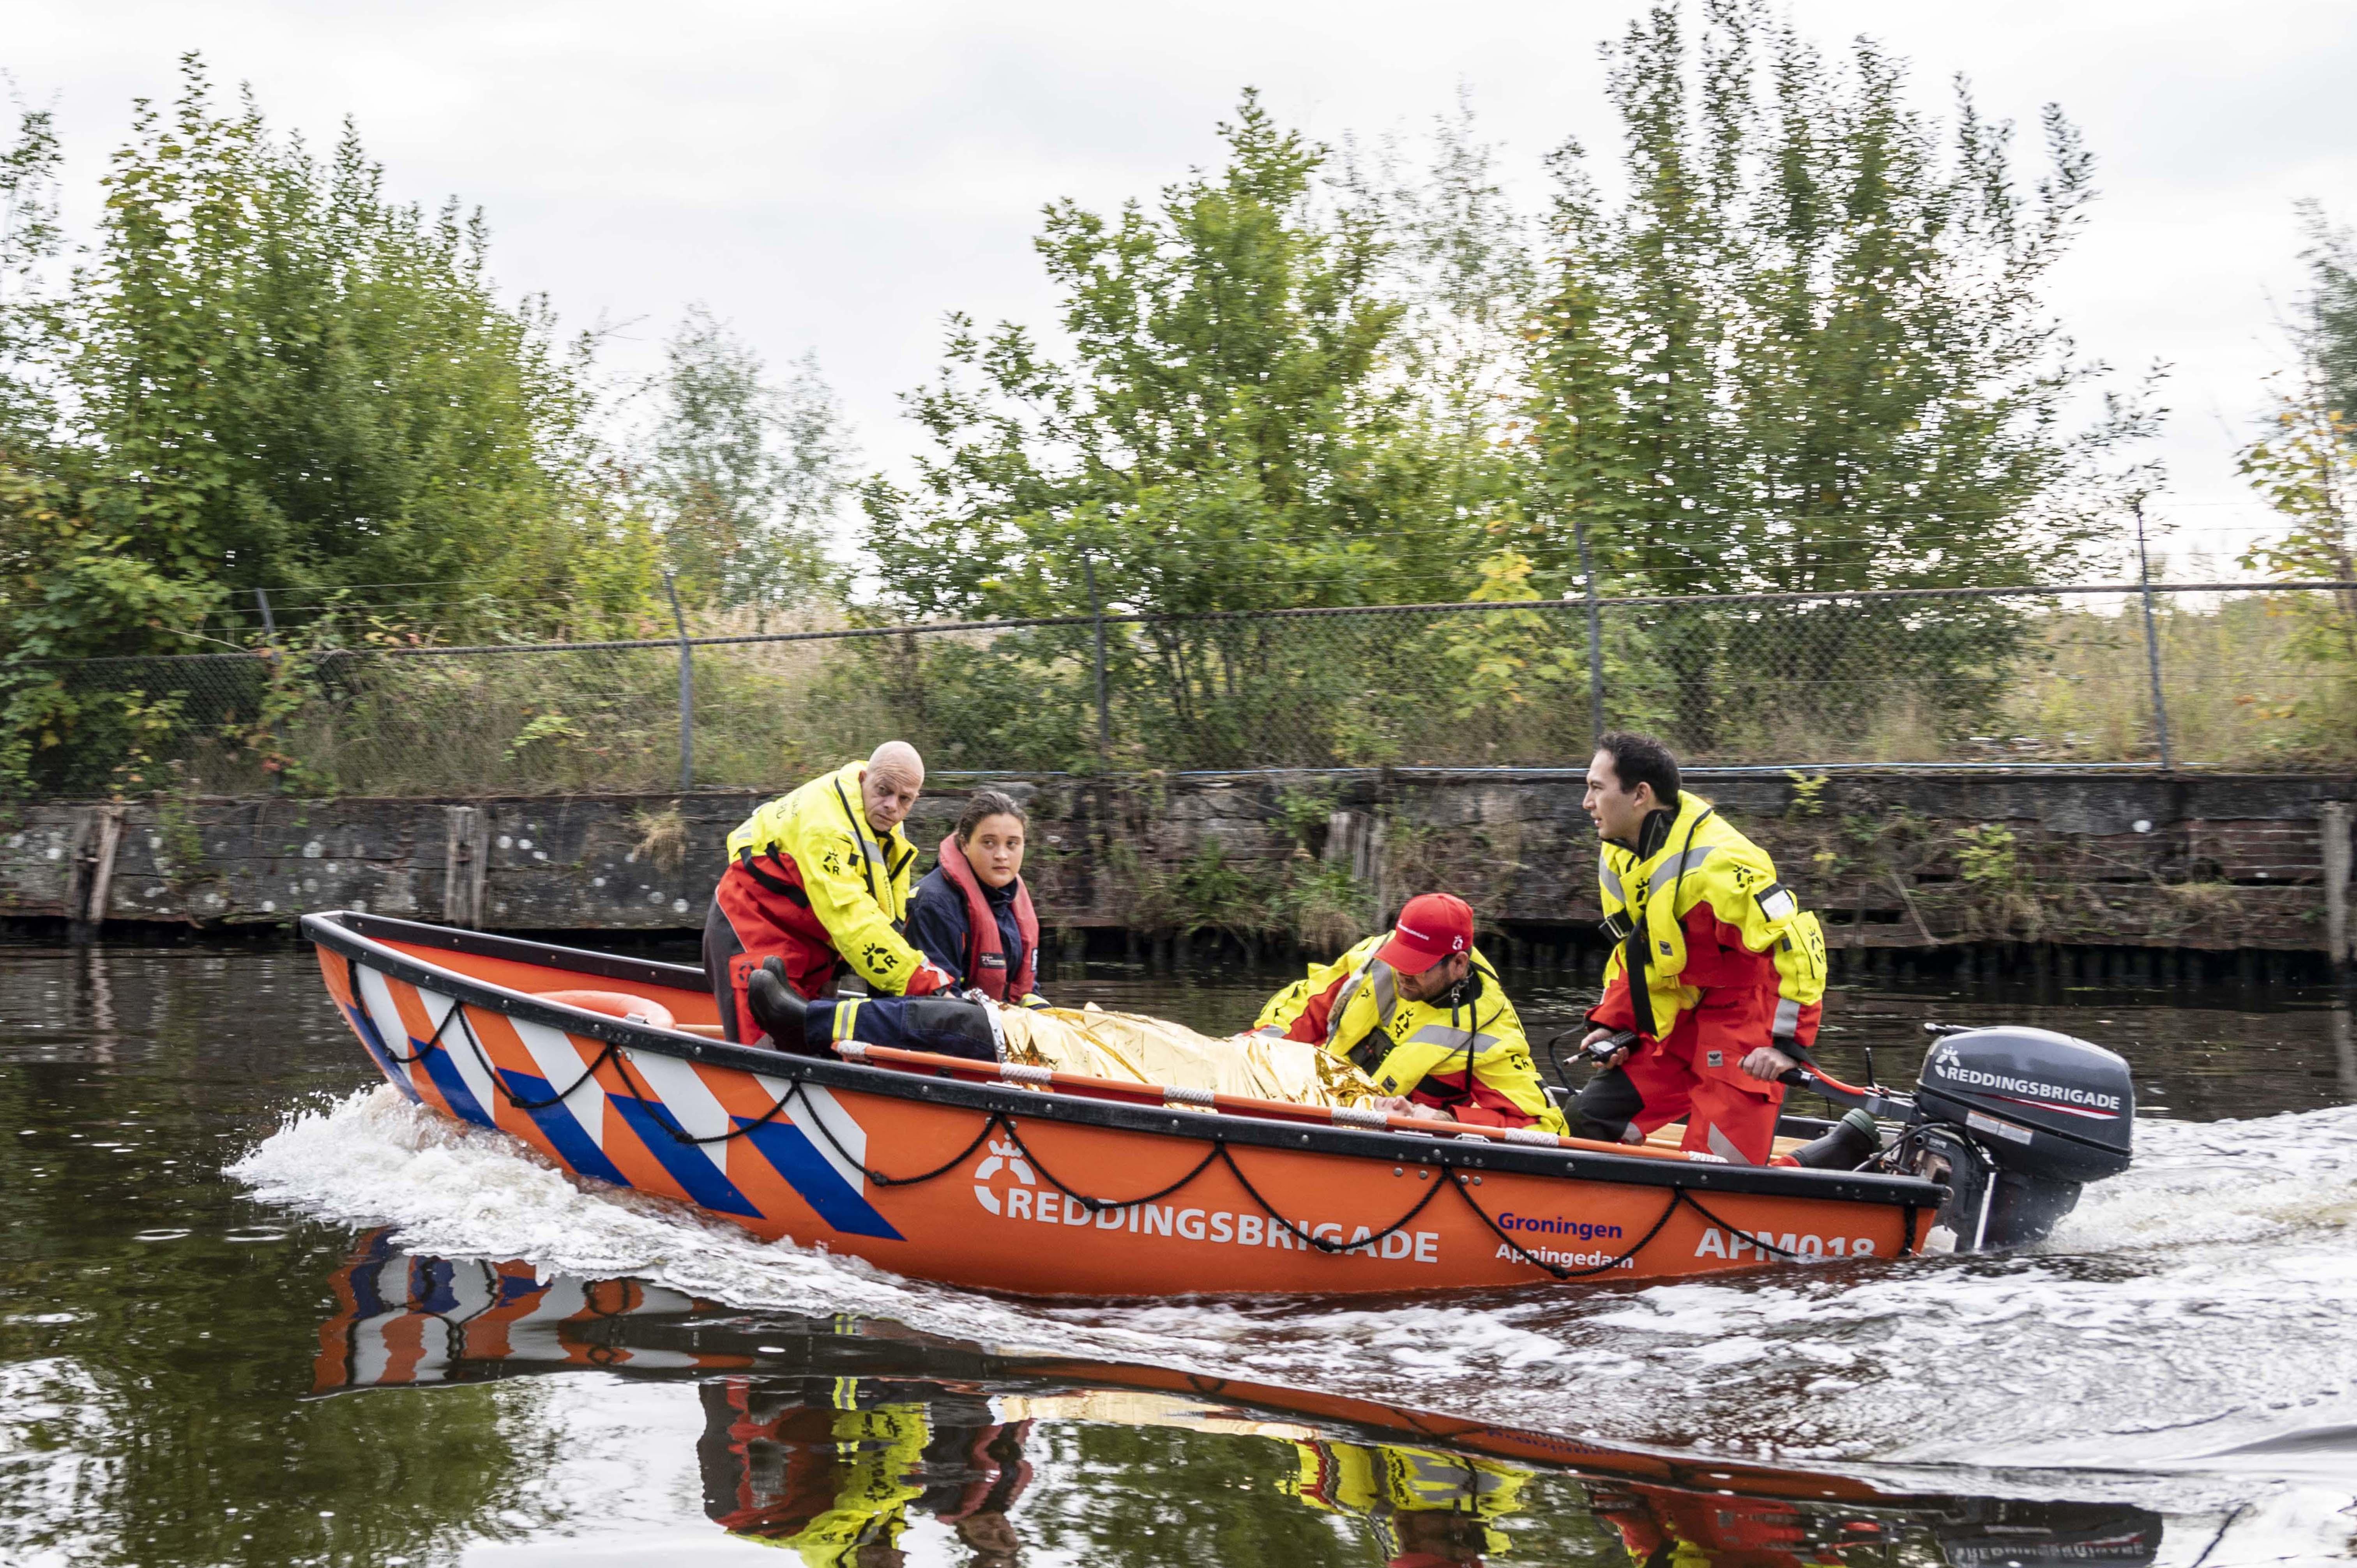 Oefening Reddingsvloot Appingedam - slachtoffer in boot